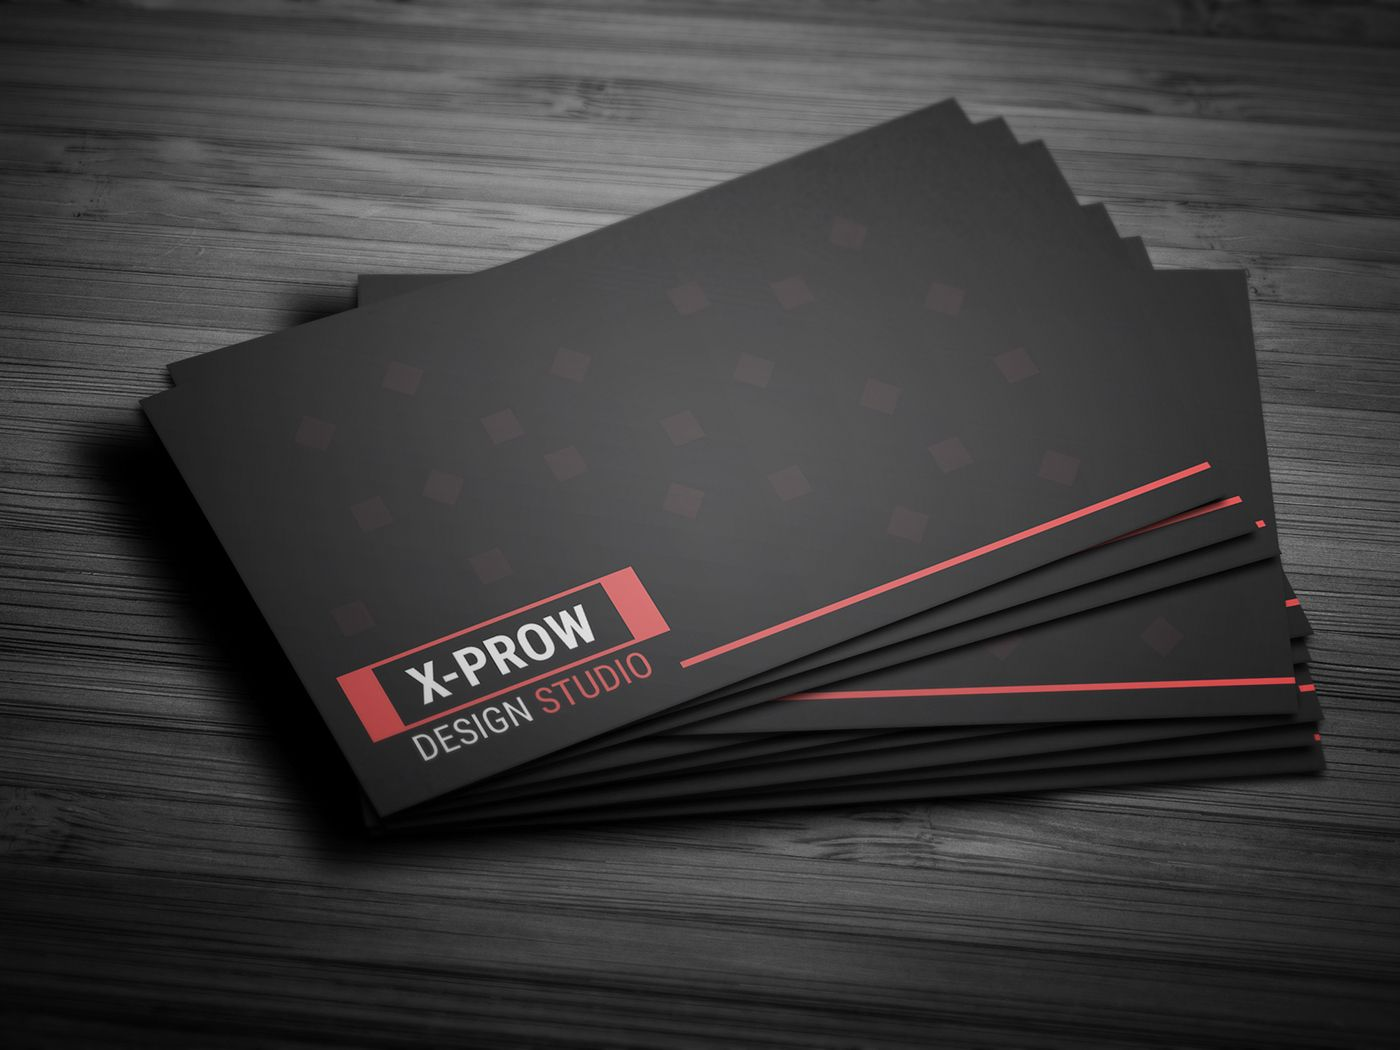 CREATIVE BUSINESS CARD TEMPLATE 3.5x2 inc - 0.25 BLEEDS - CMYK COLOR ...